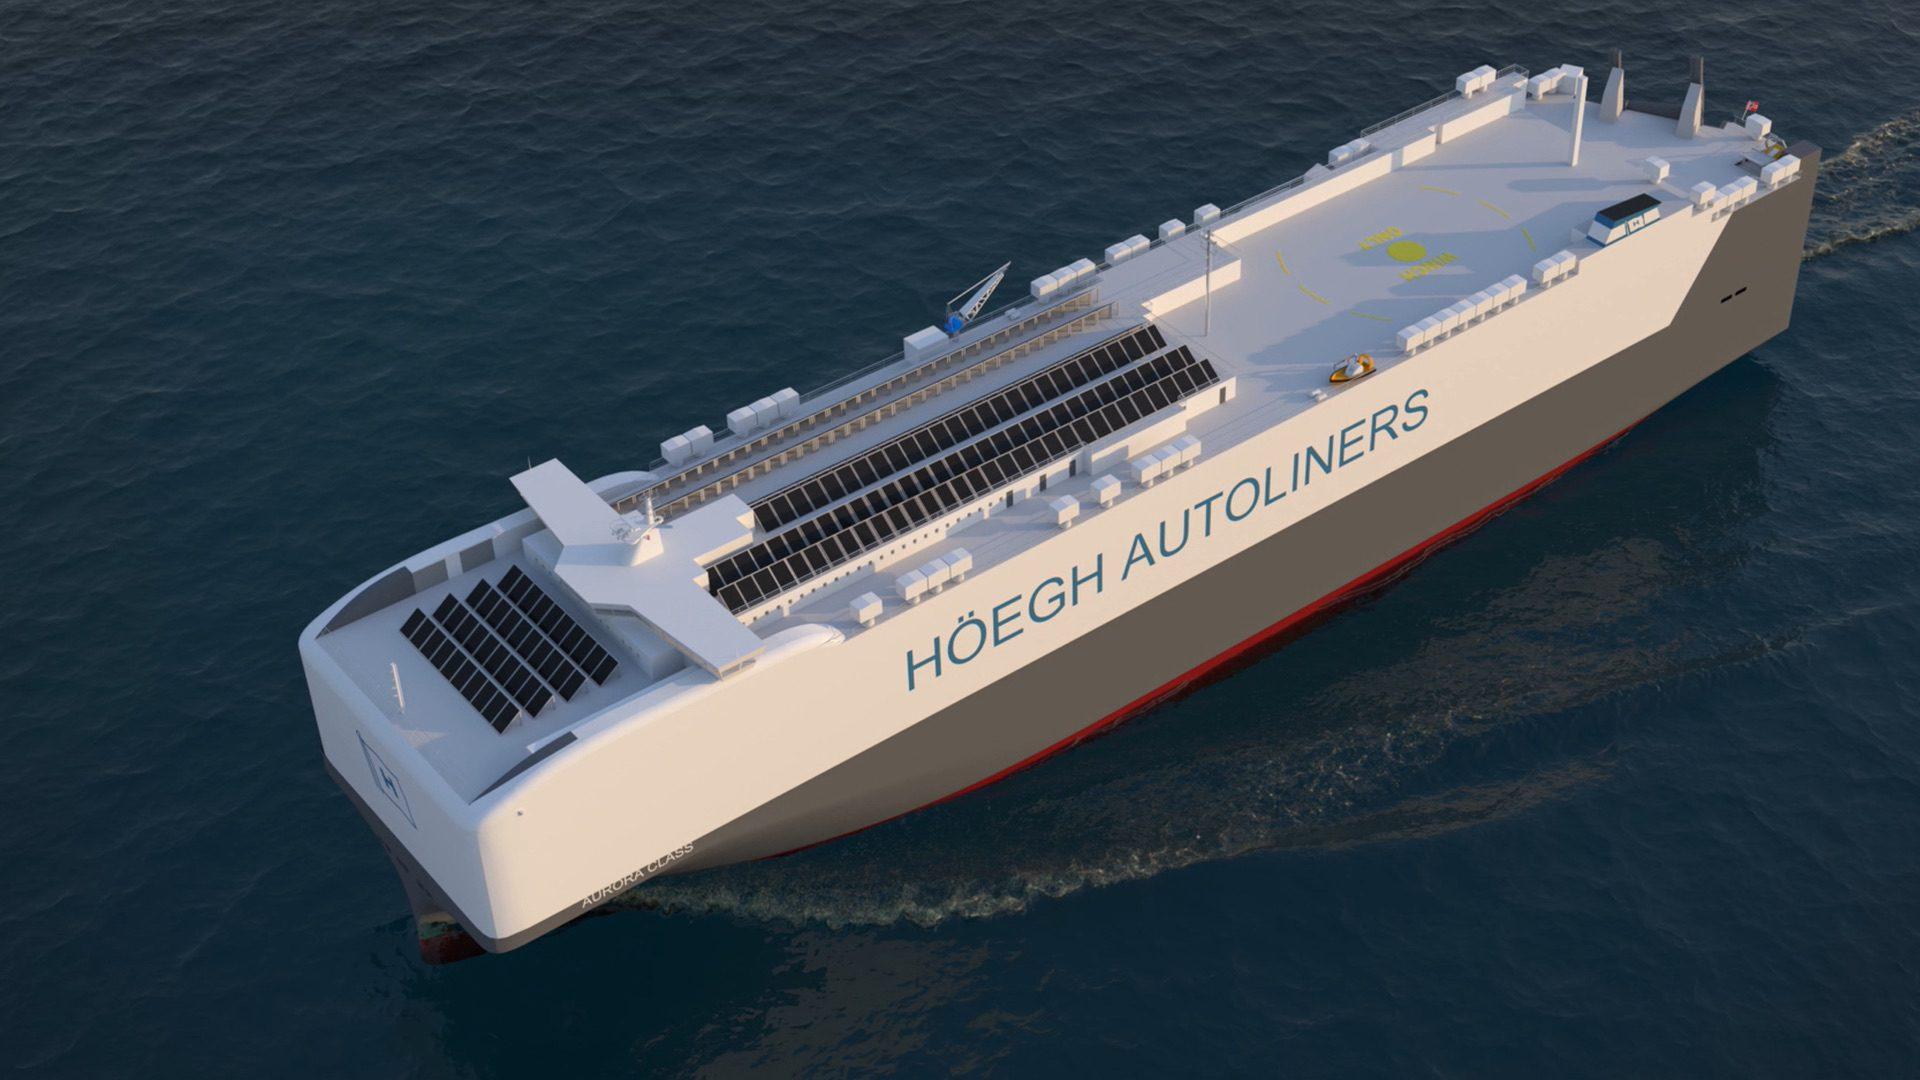 Aurora Class car carrier